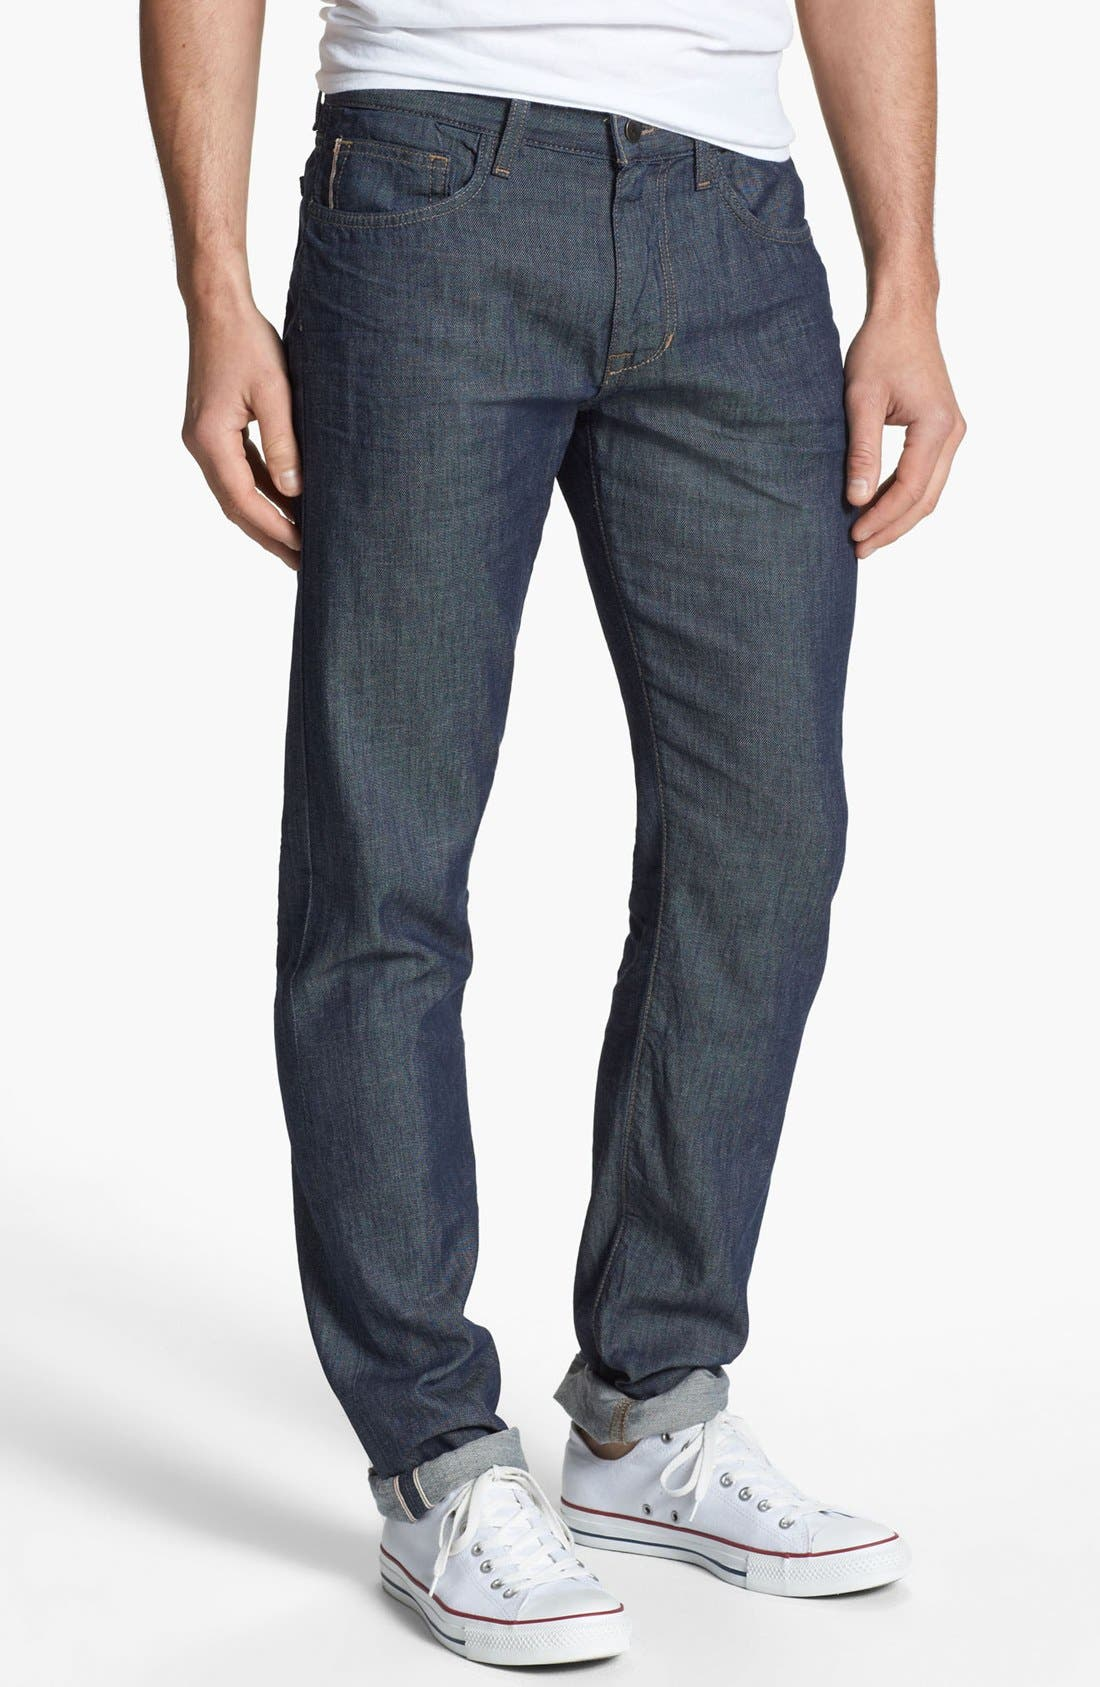 Alternate Image 2  - Joe's 'Brixton' Slim Fit Selvedge Jeans (Laures)